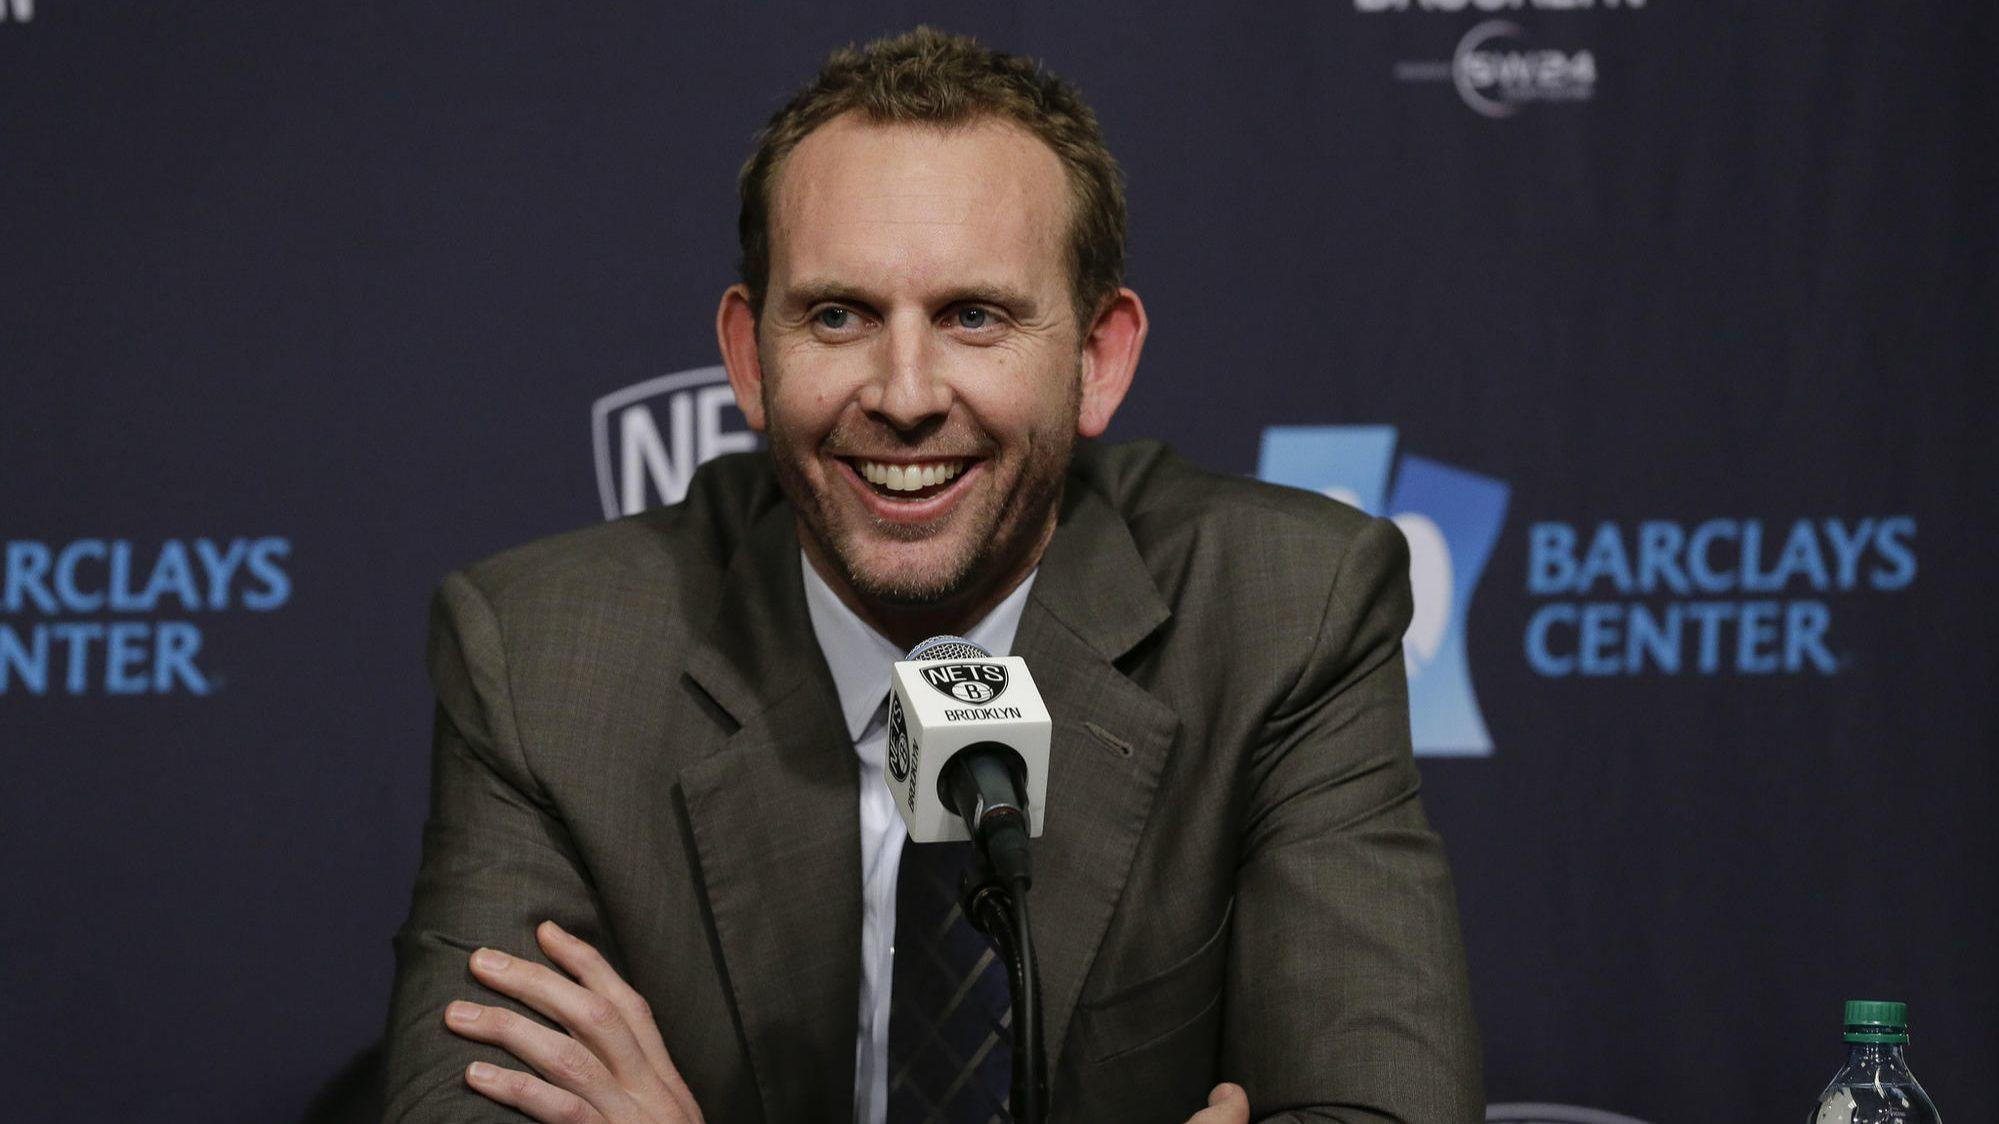 NBA fines, suspends Nets GM for entering refs locker room